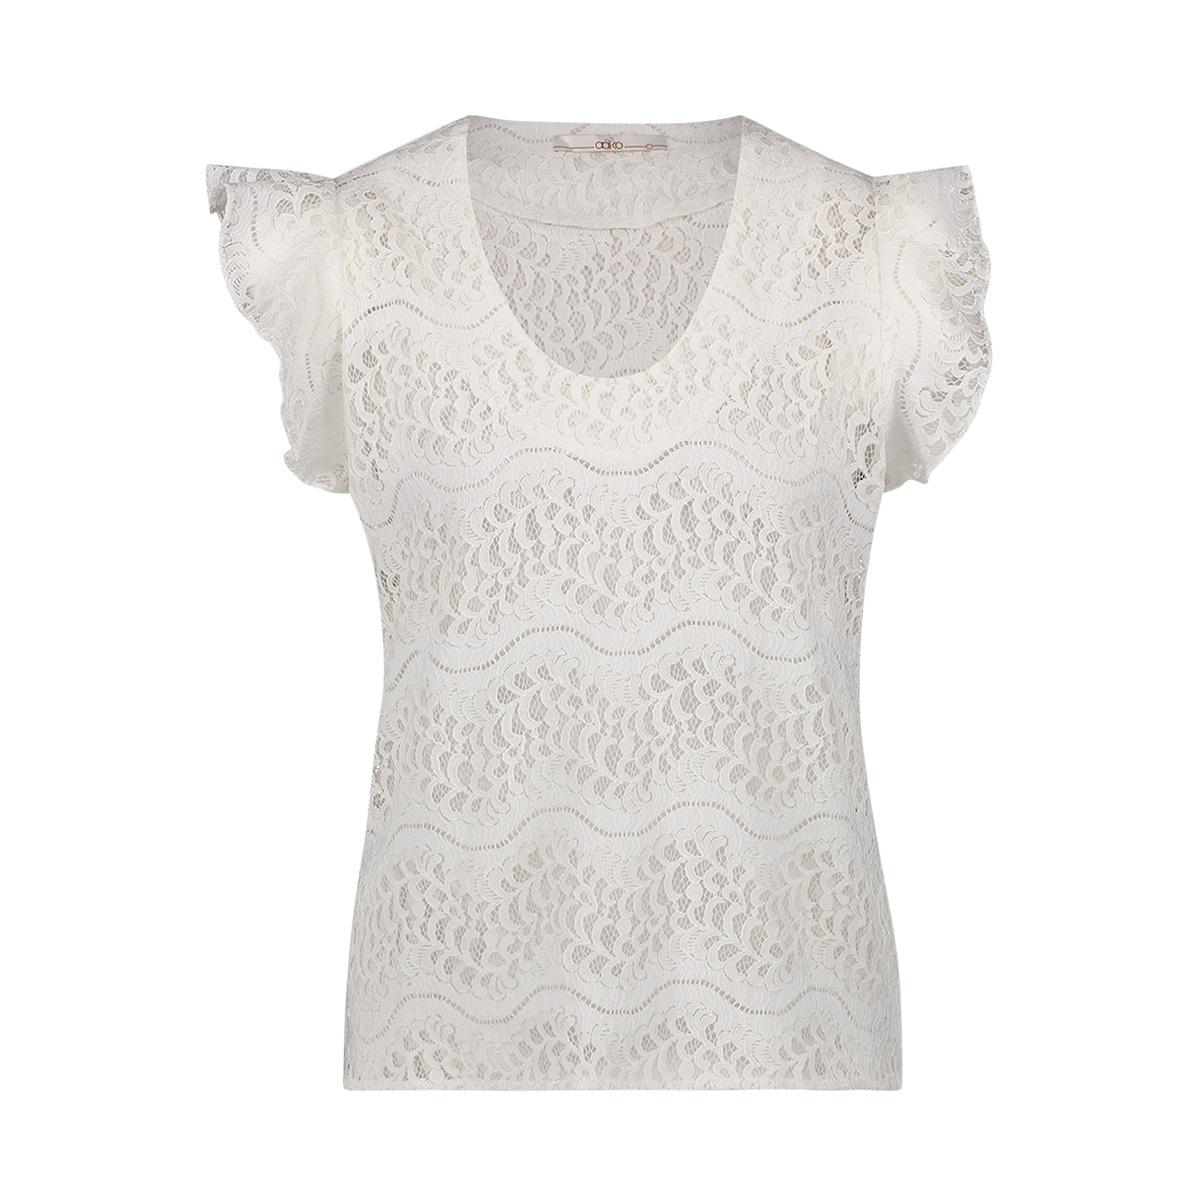 deno lace co 513 aaiko t-shirt les blancs